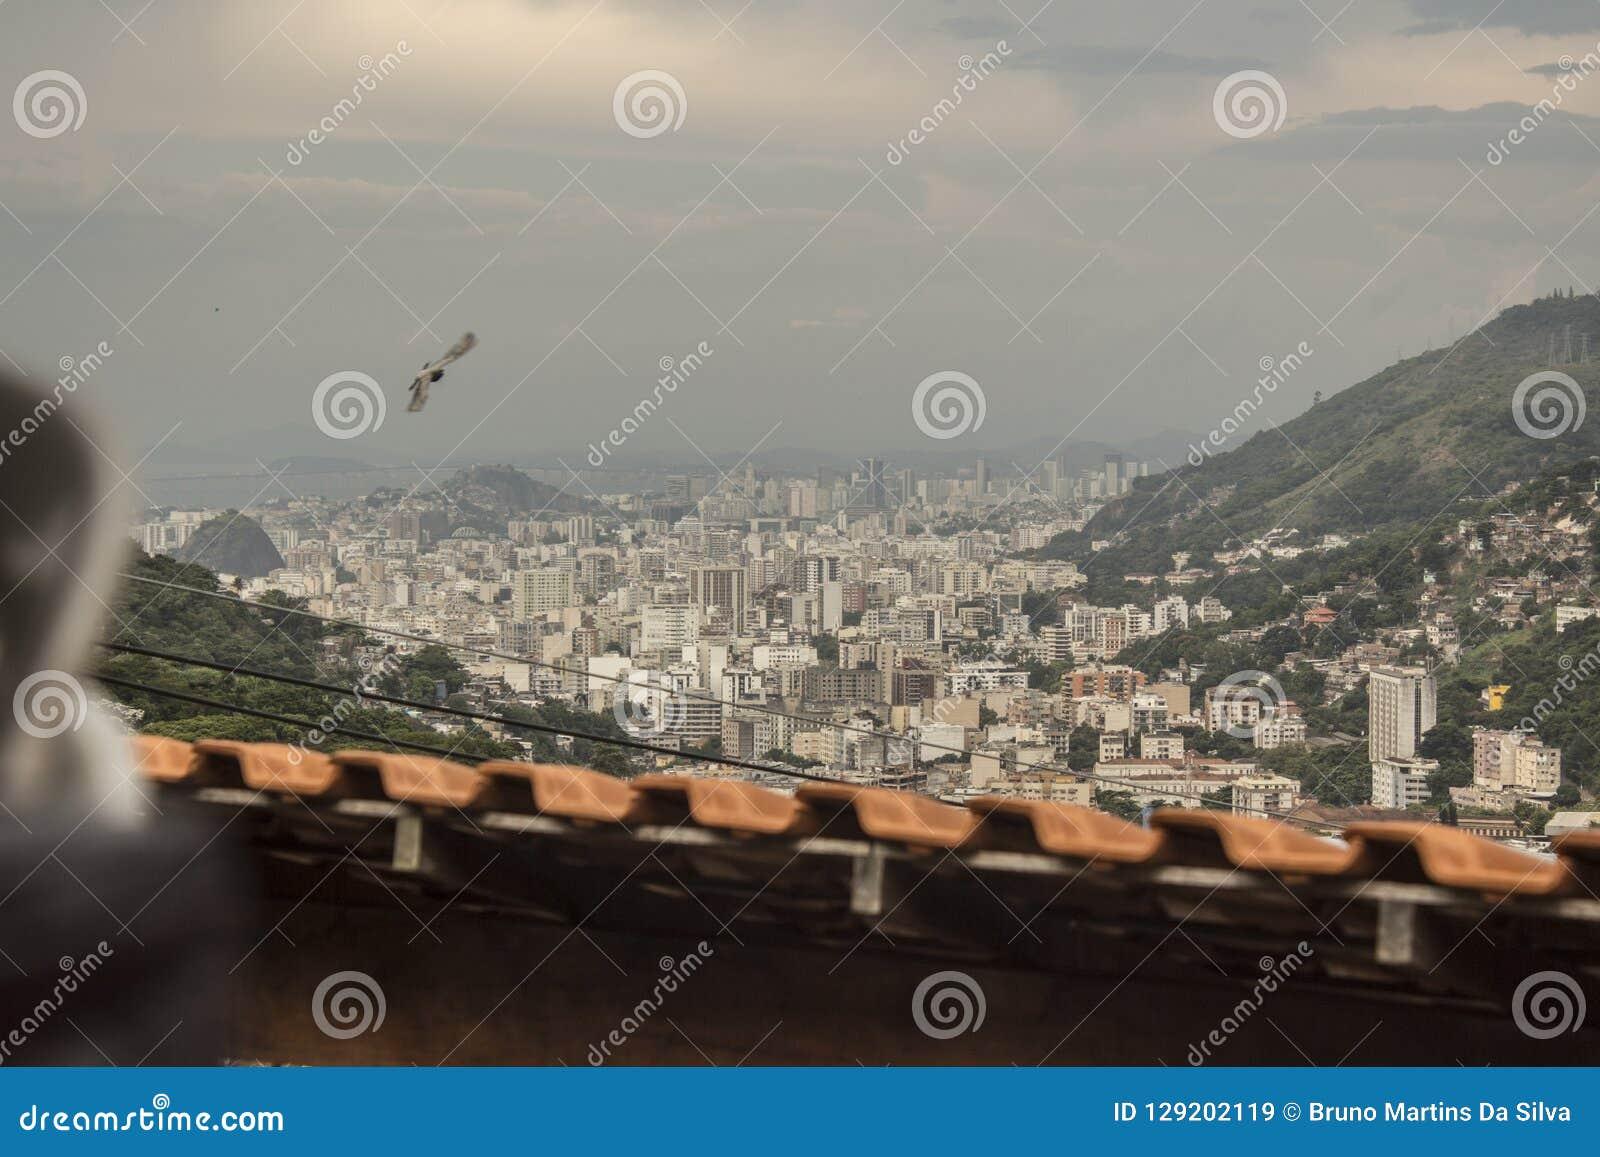 Details of Catrambi favela in Rio de Janeiro - brazil